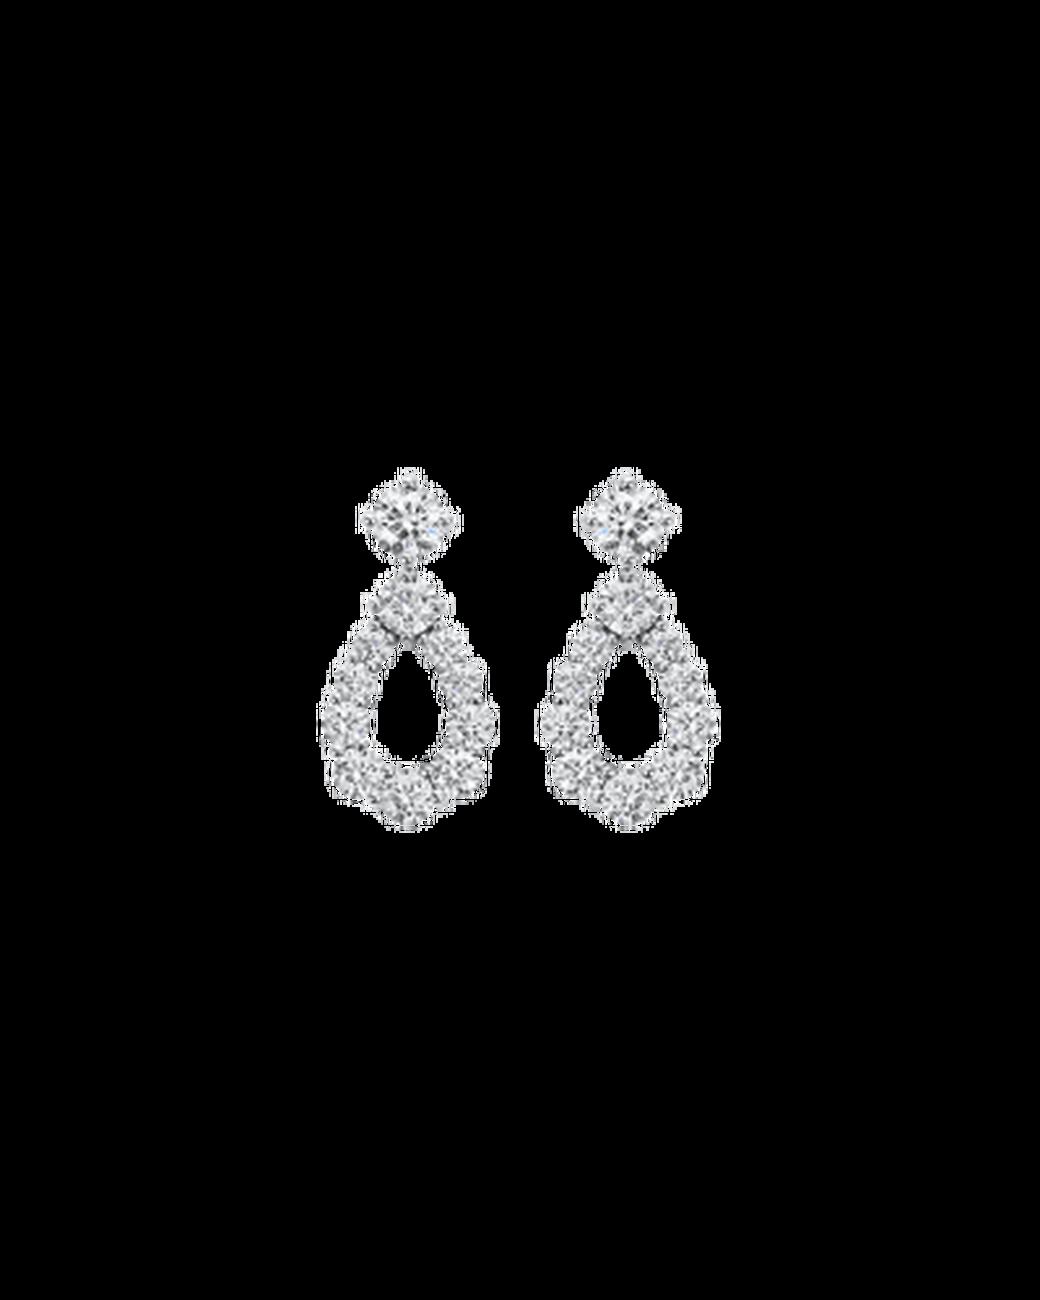 "Wedding Earrings for Every Bride, Harry Winston ""Diamond Loop"" Earring"